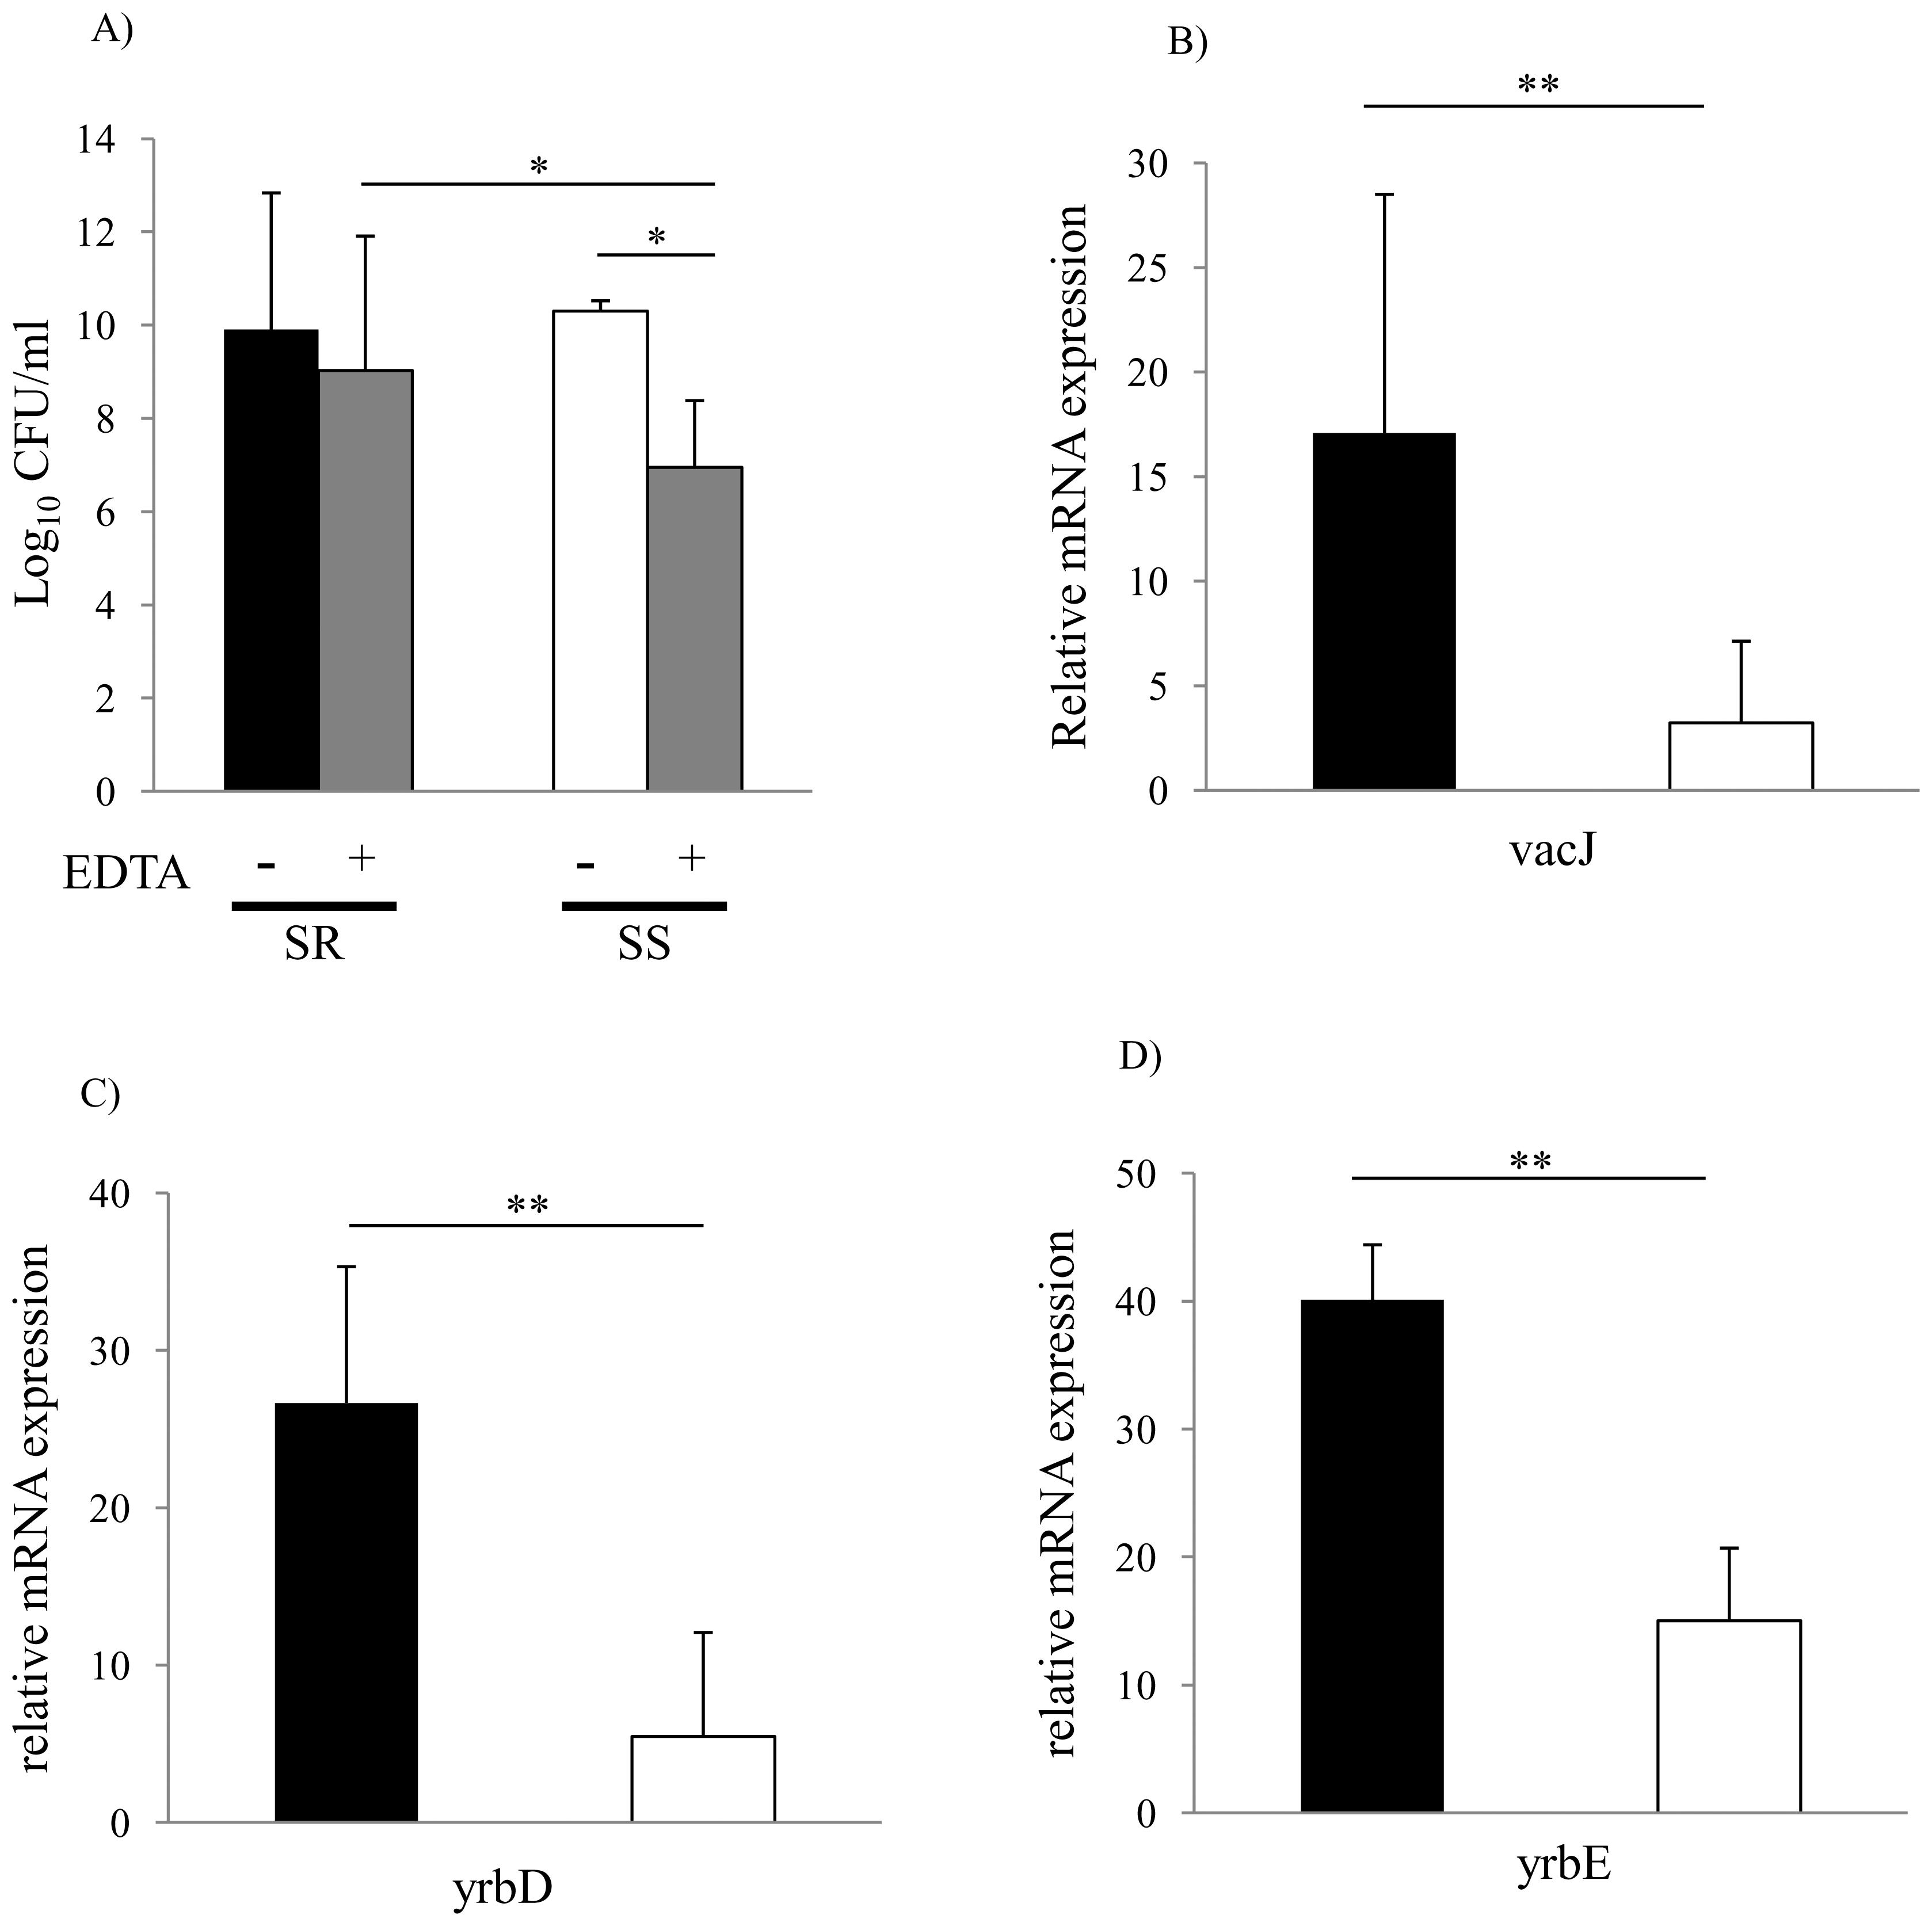 Membrane stability and <i>vacJ</i> and <i>yrb</i> expression among clinical isolates.